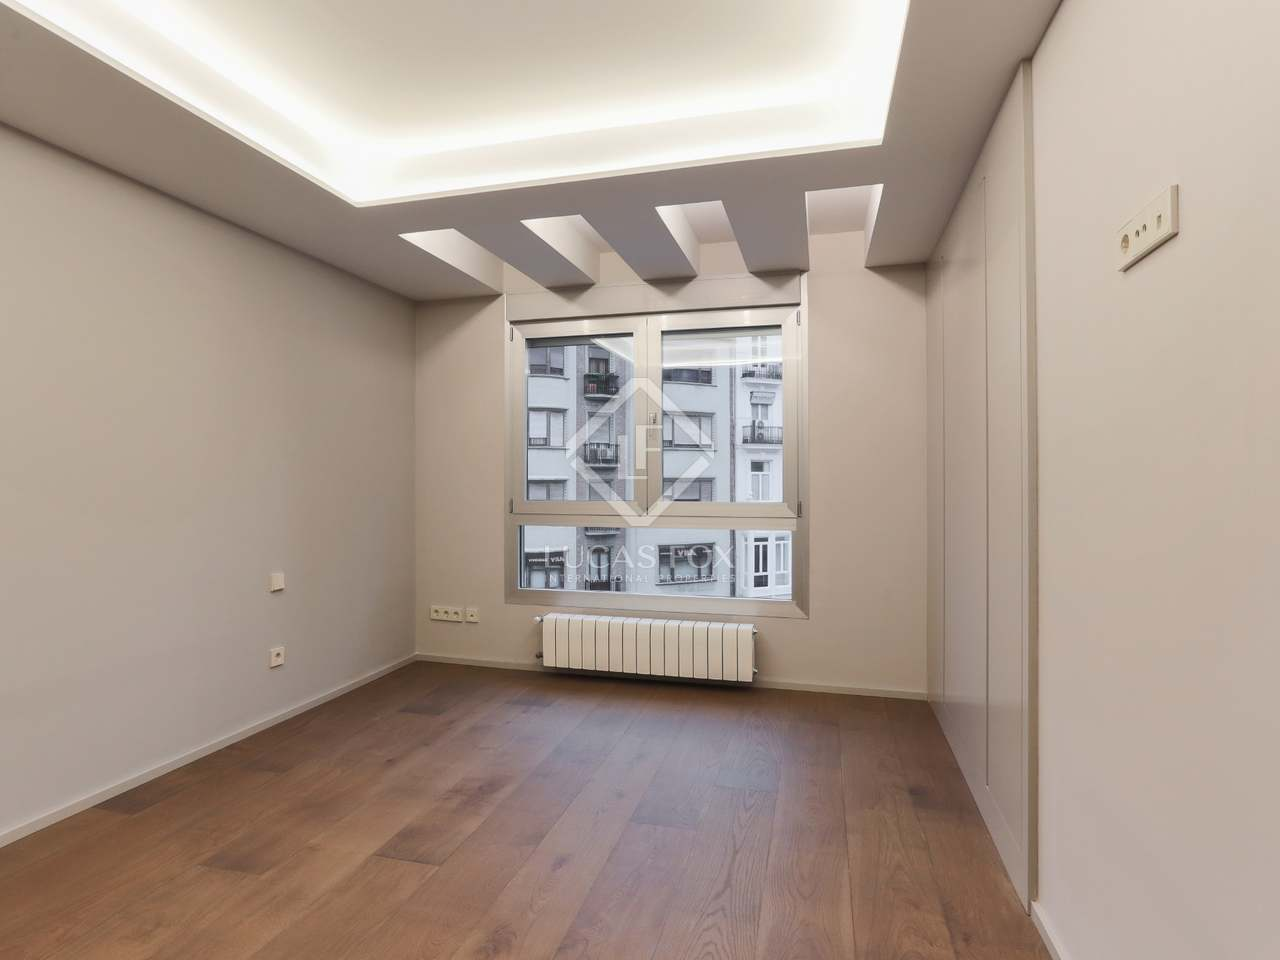 300 M 178 Apartment For Sale In Sant Francesc Valencia